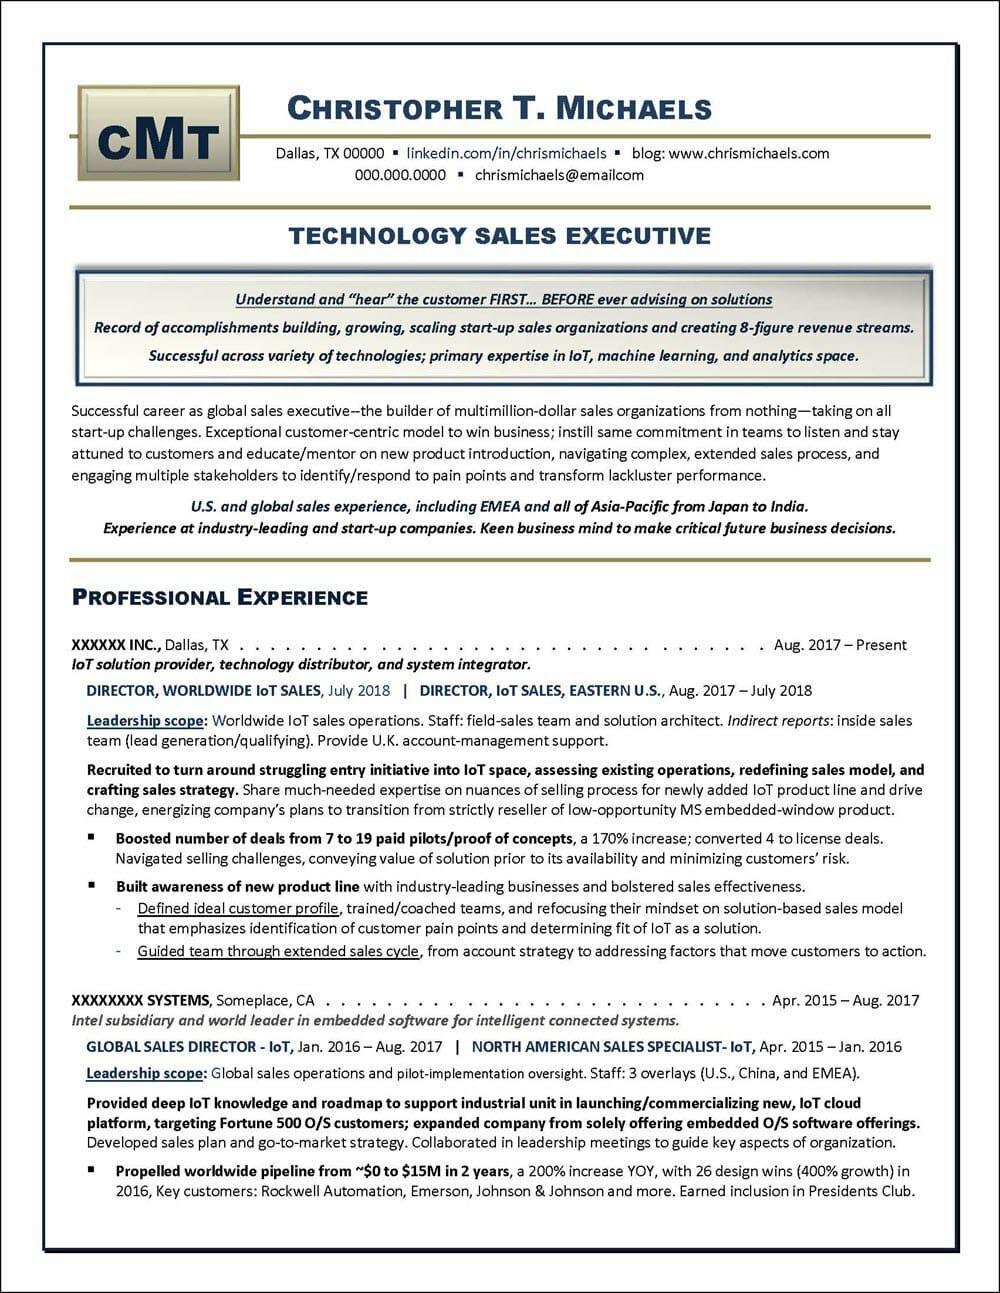 Technology Sales Executive Resume Distinctive Career Services Executive Resume Job Resume Examples Resume Examples